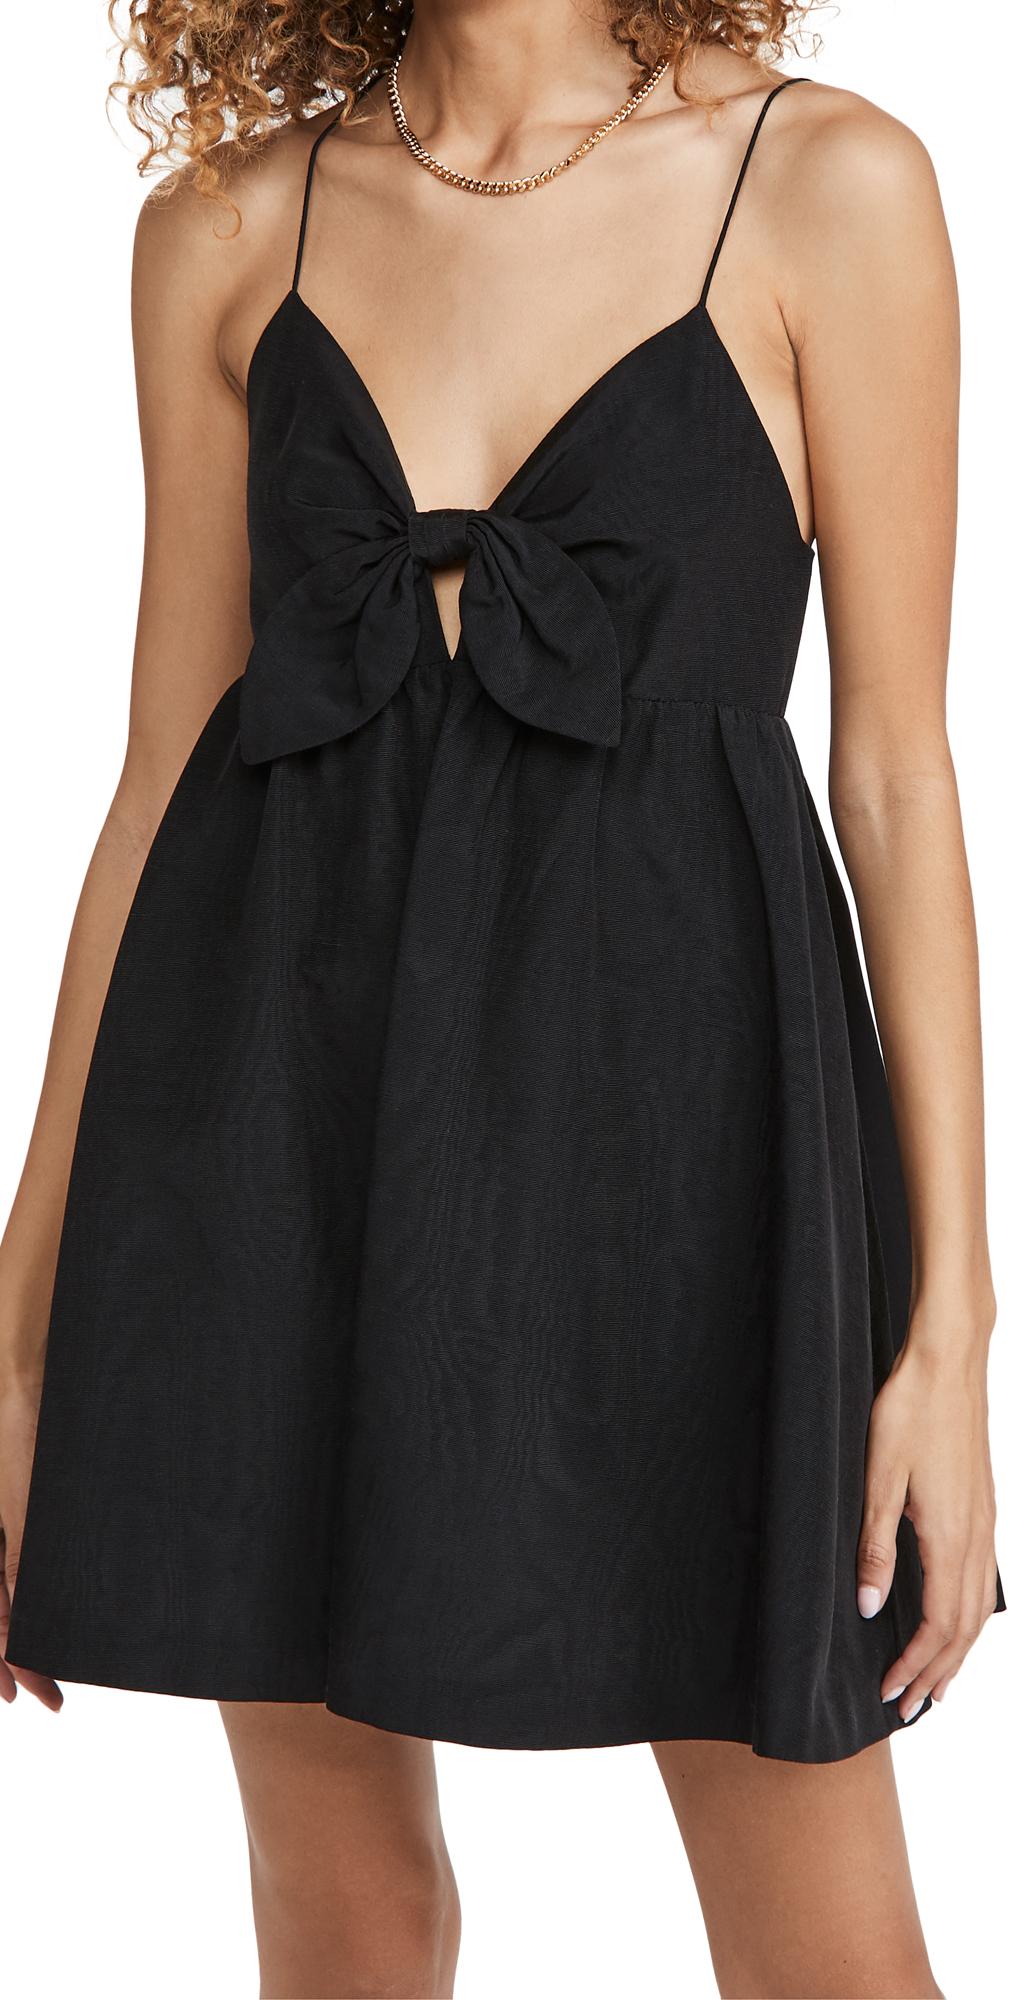 alice + olivia Melvina Tie Gathered Babydoll Dress